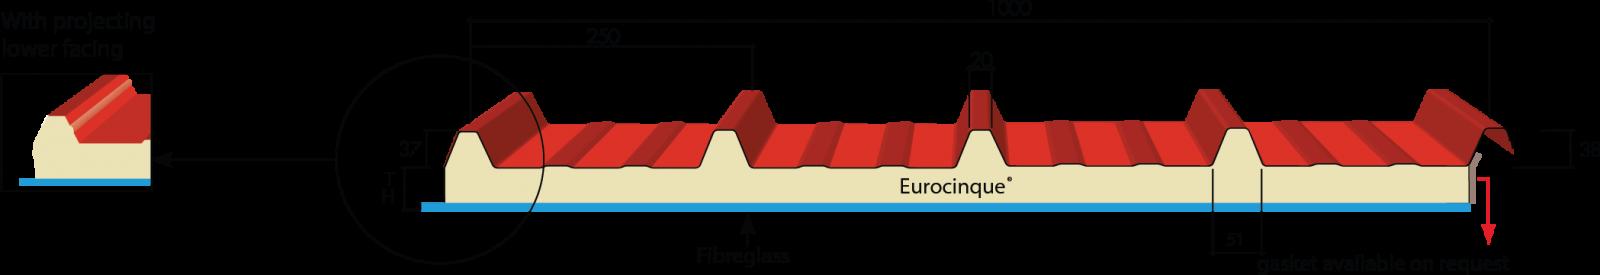 GLOBE ROOF FIBERGLASS